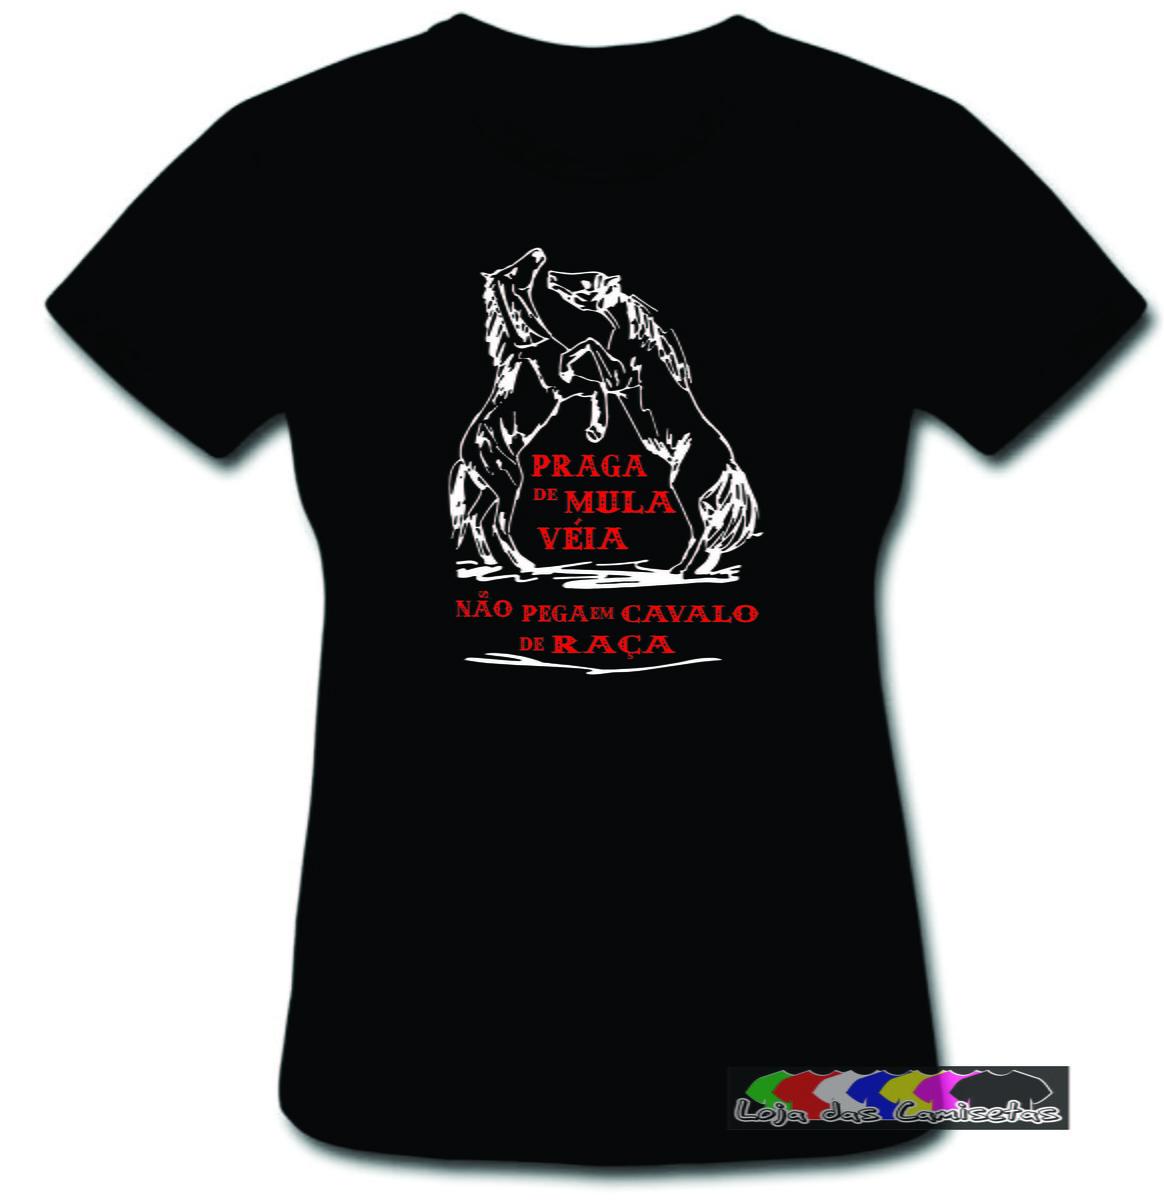 Camiseta Baby Look Frases Brutas No Elo7 Loja Das Camisetas 75cf16